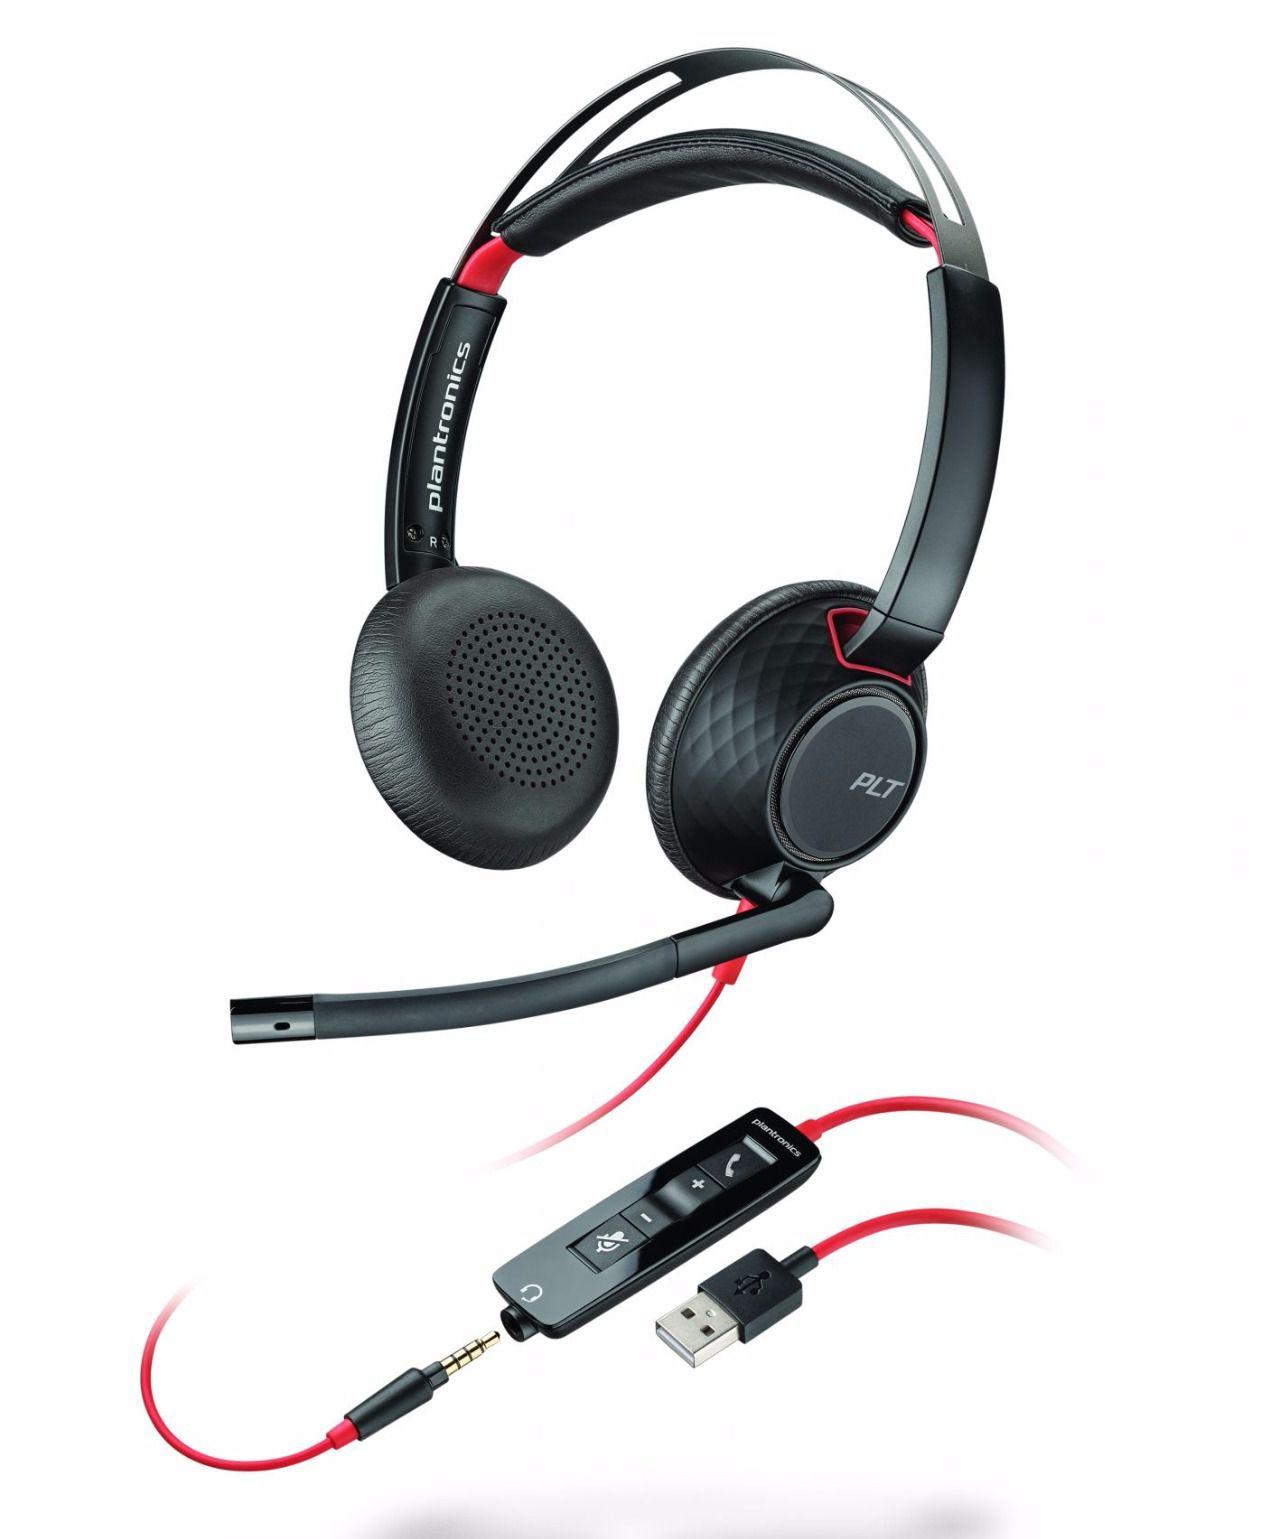 Blackwire 5200